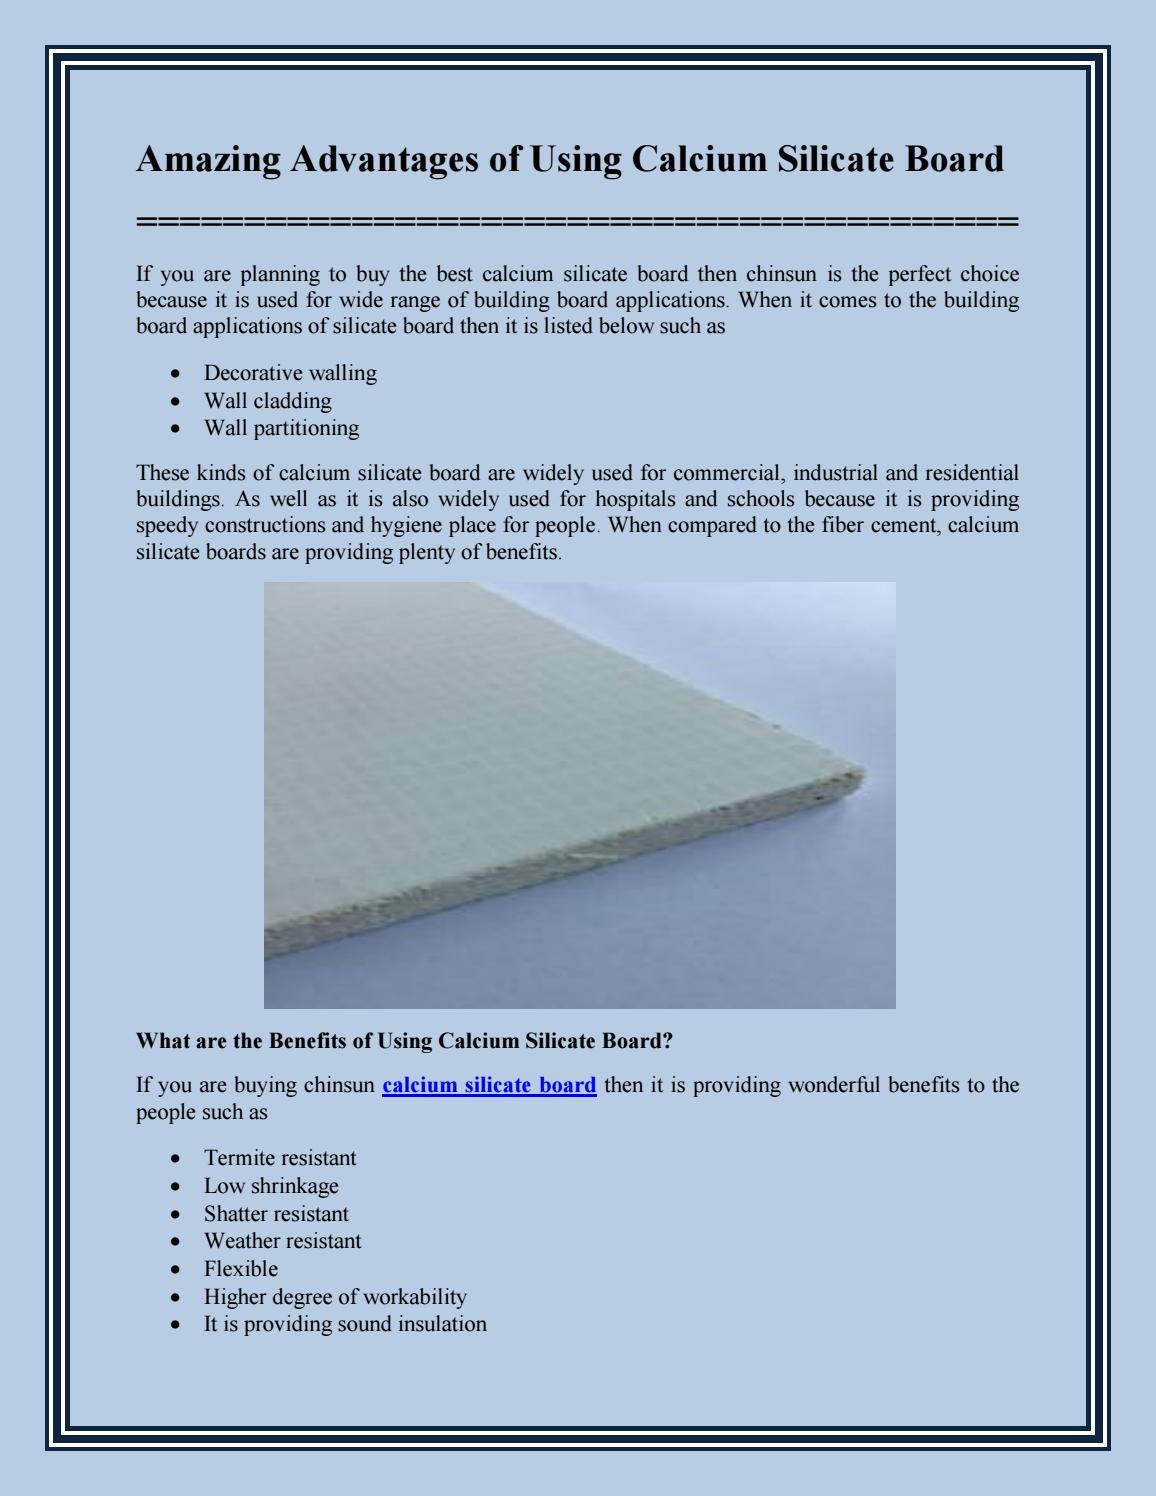 Bulkhead And Calcium Silicate Board : Amazing advantages of using calcium silicate board by